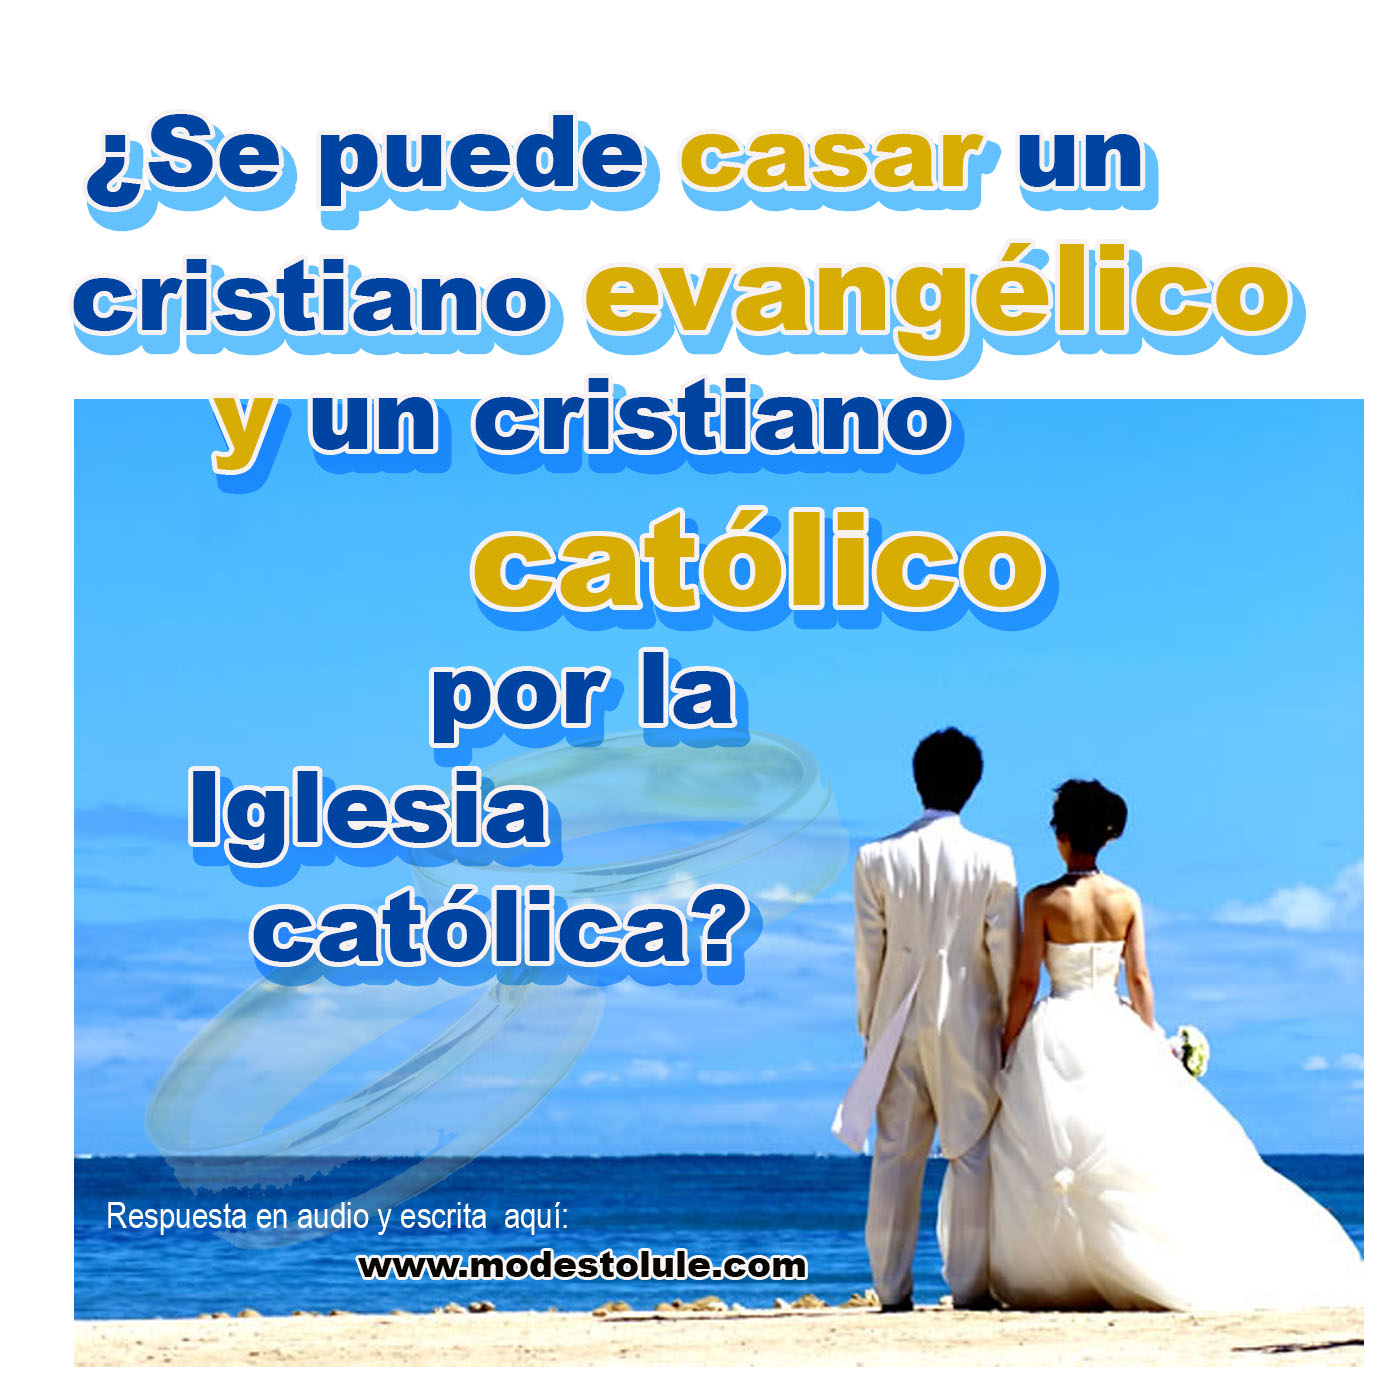 Matrimonio Catolico Y Evangelico : Podcast´s católico puede un cristiano evangélico casarse